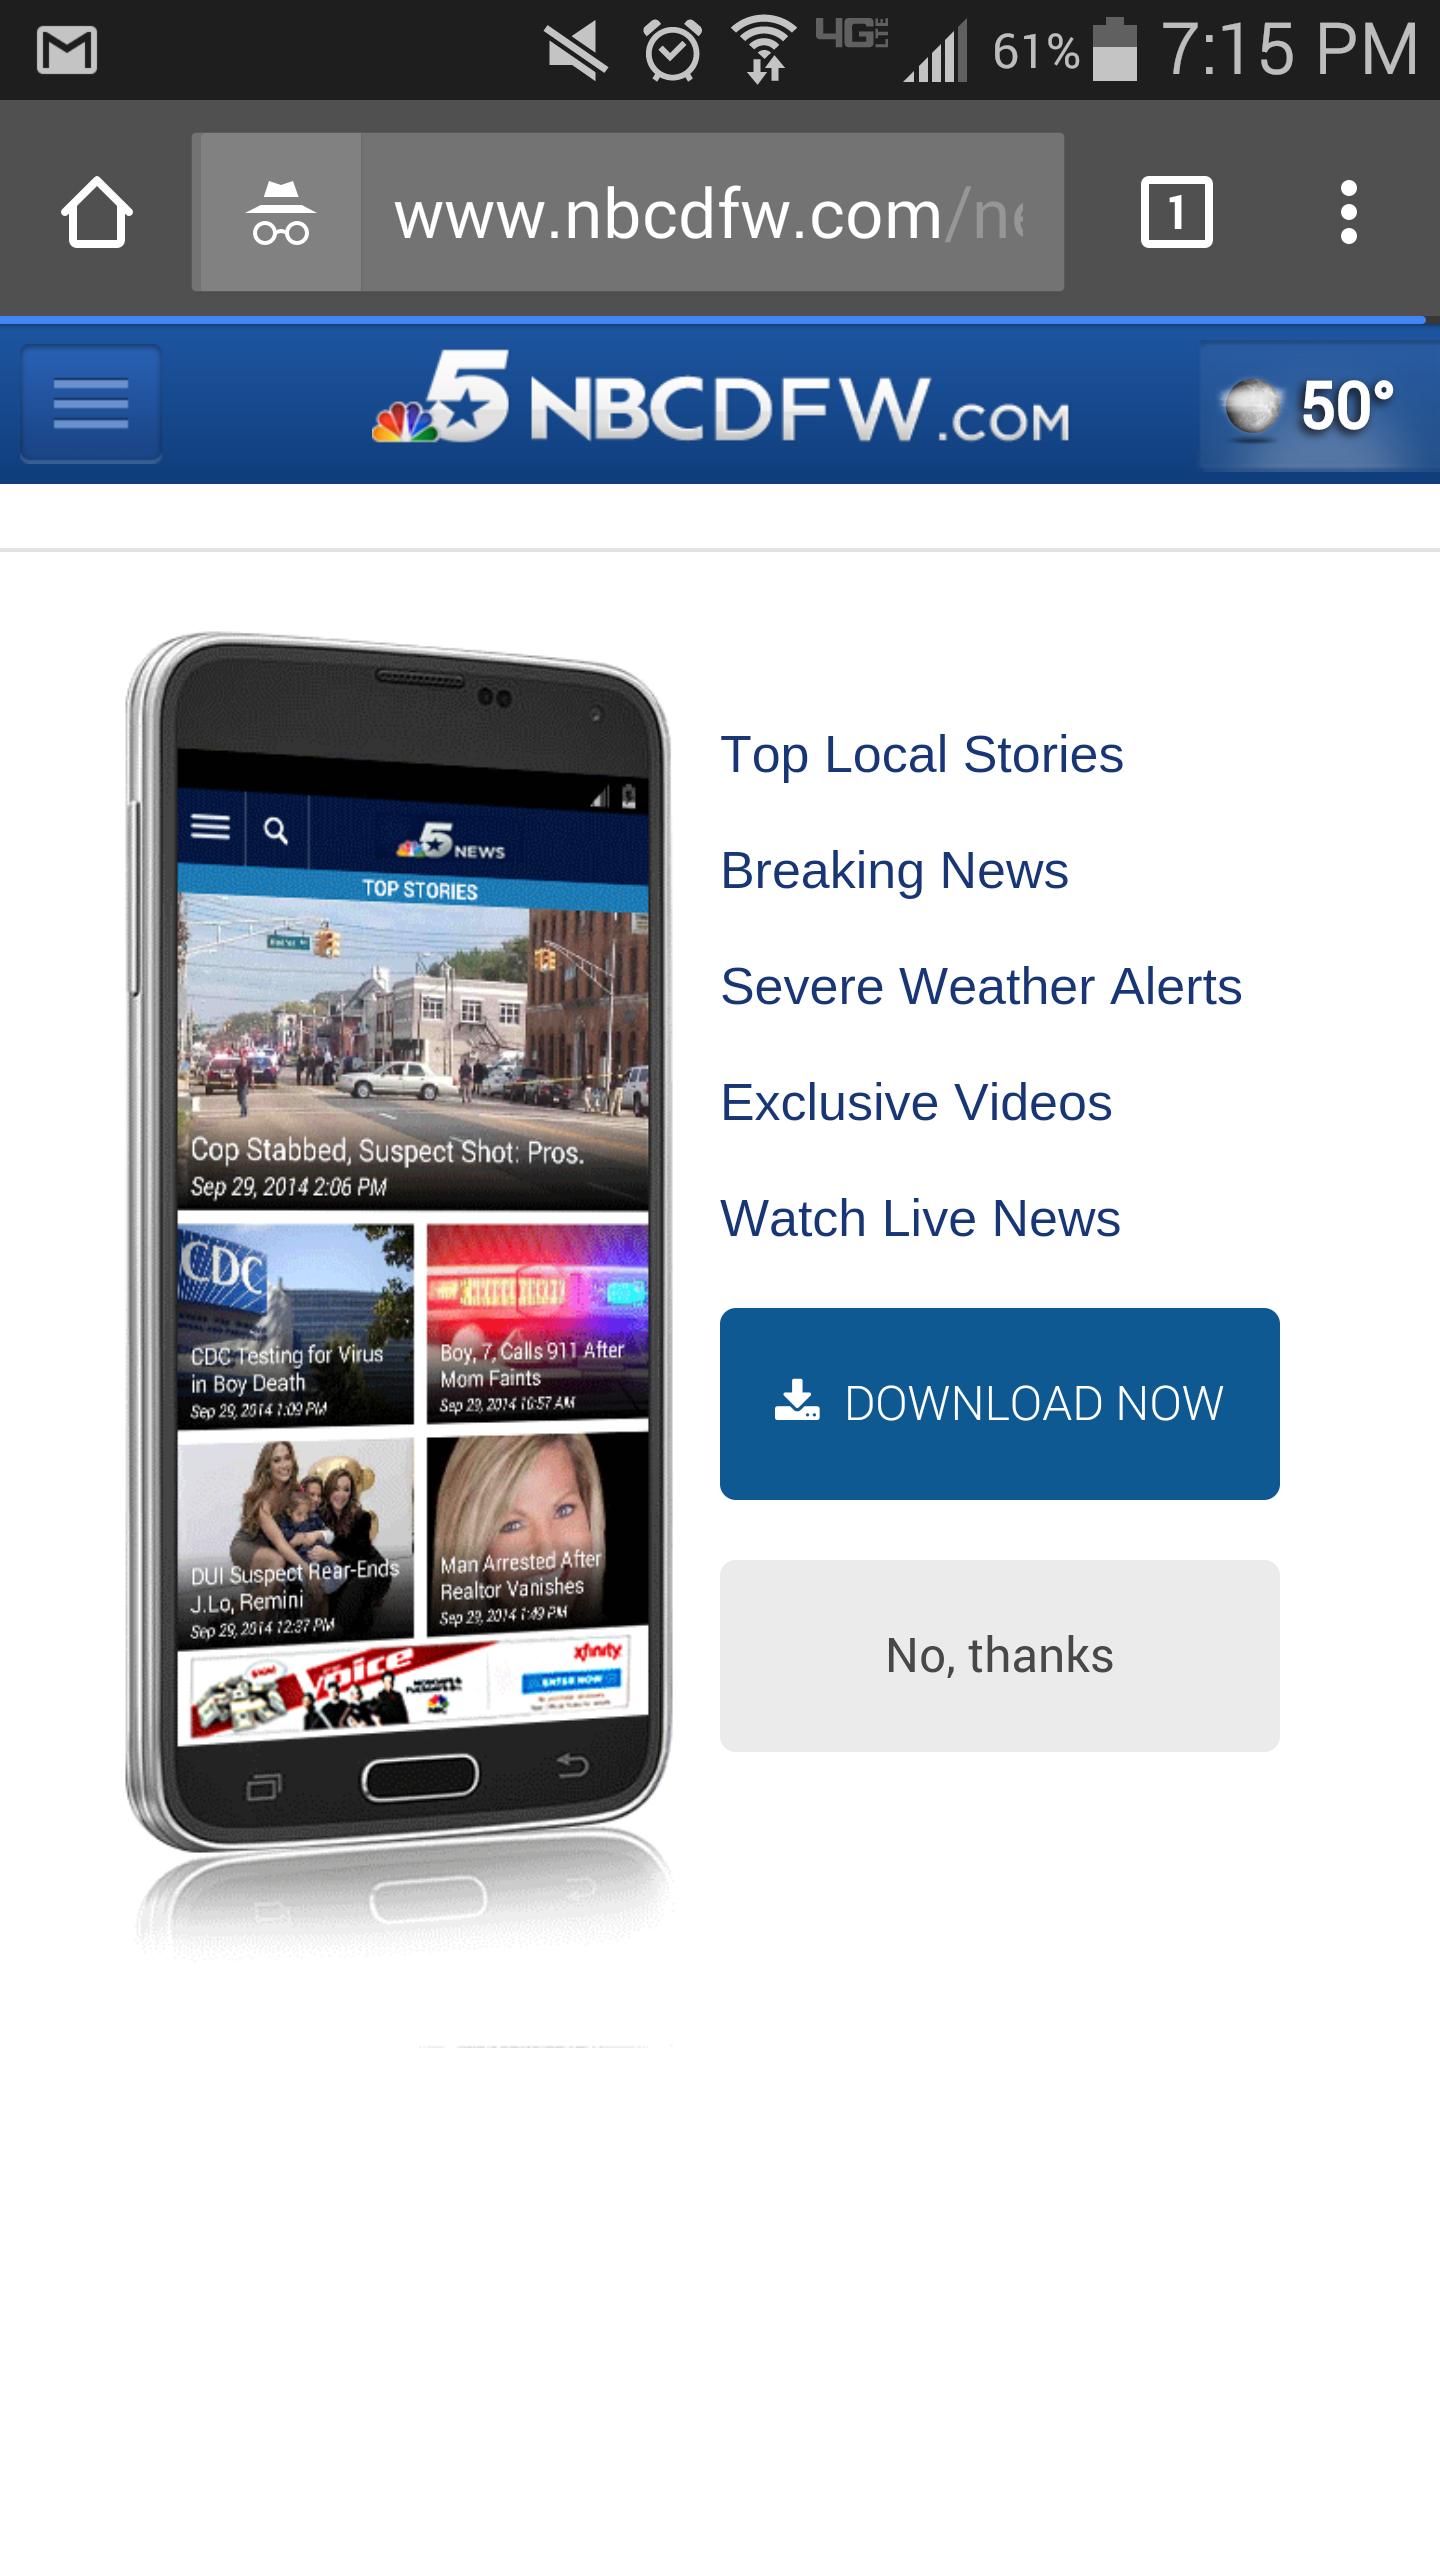 Mobile web - promoting native app